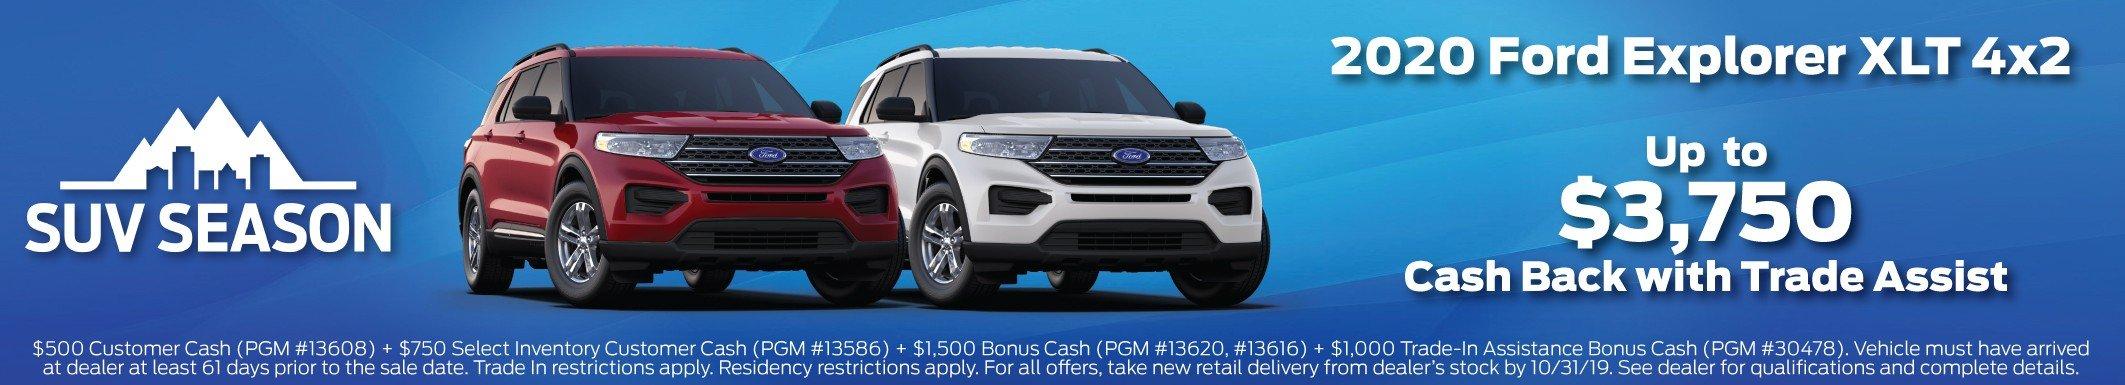 2020 Explorer Incentive 10-31-2019